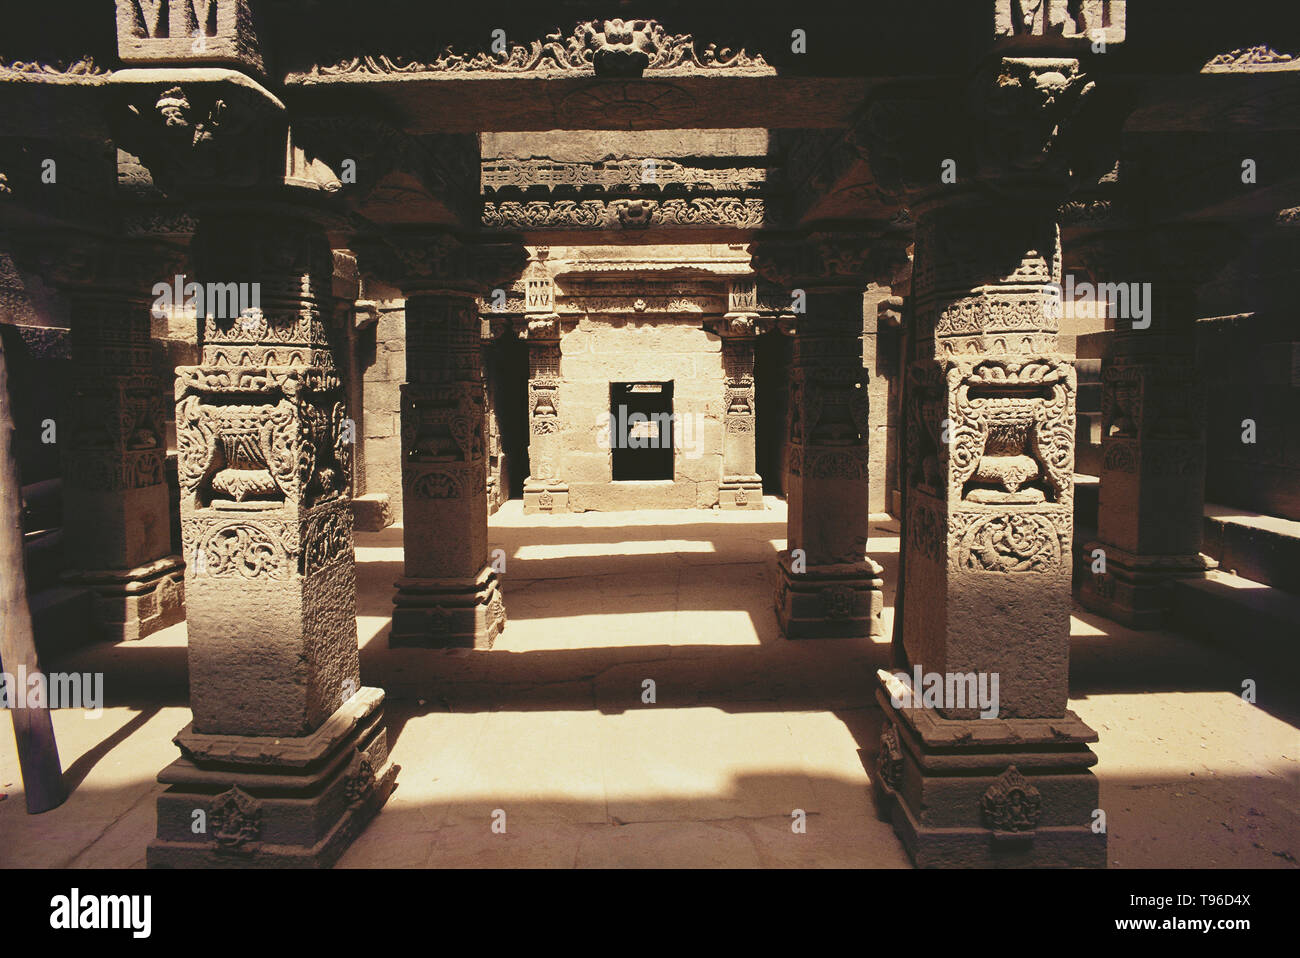 SCUPTURE ADORNING THE COLUMNS, THE STEPWELLS OF ADALAJ, GUJARAT, INDIA, ASIA - Stock Image